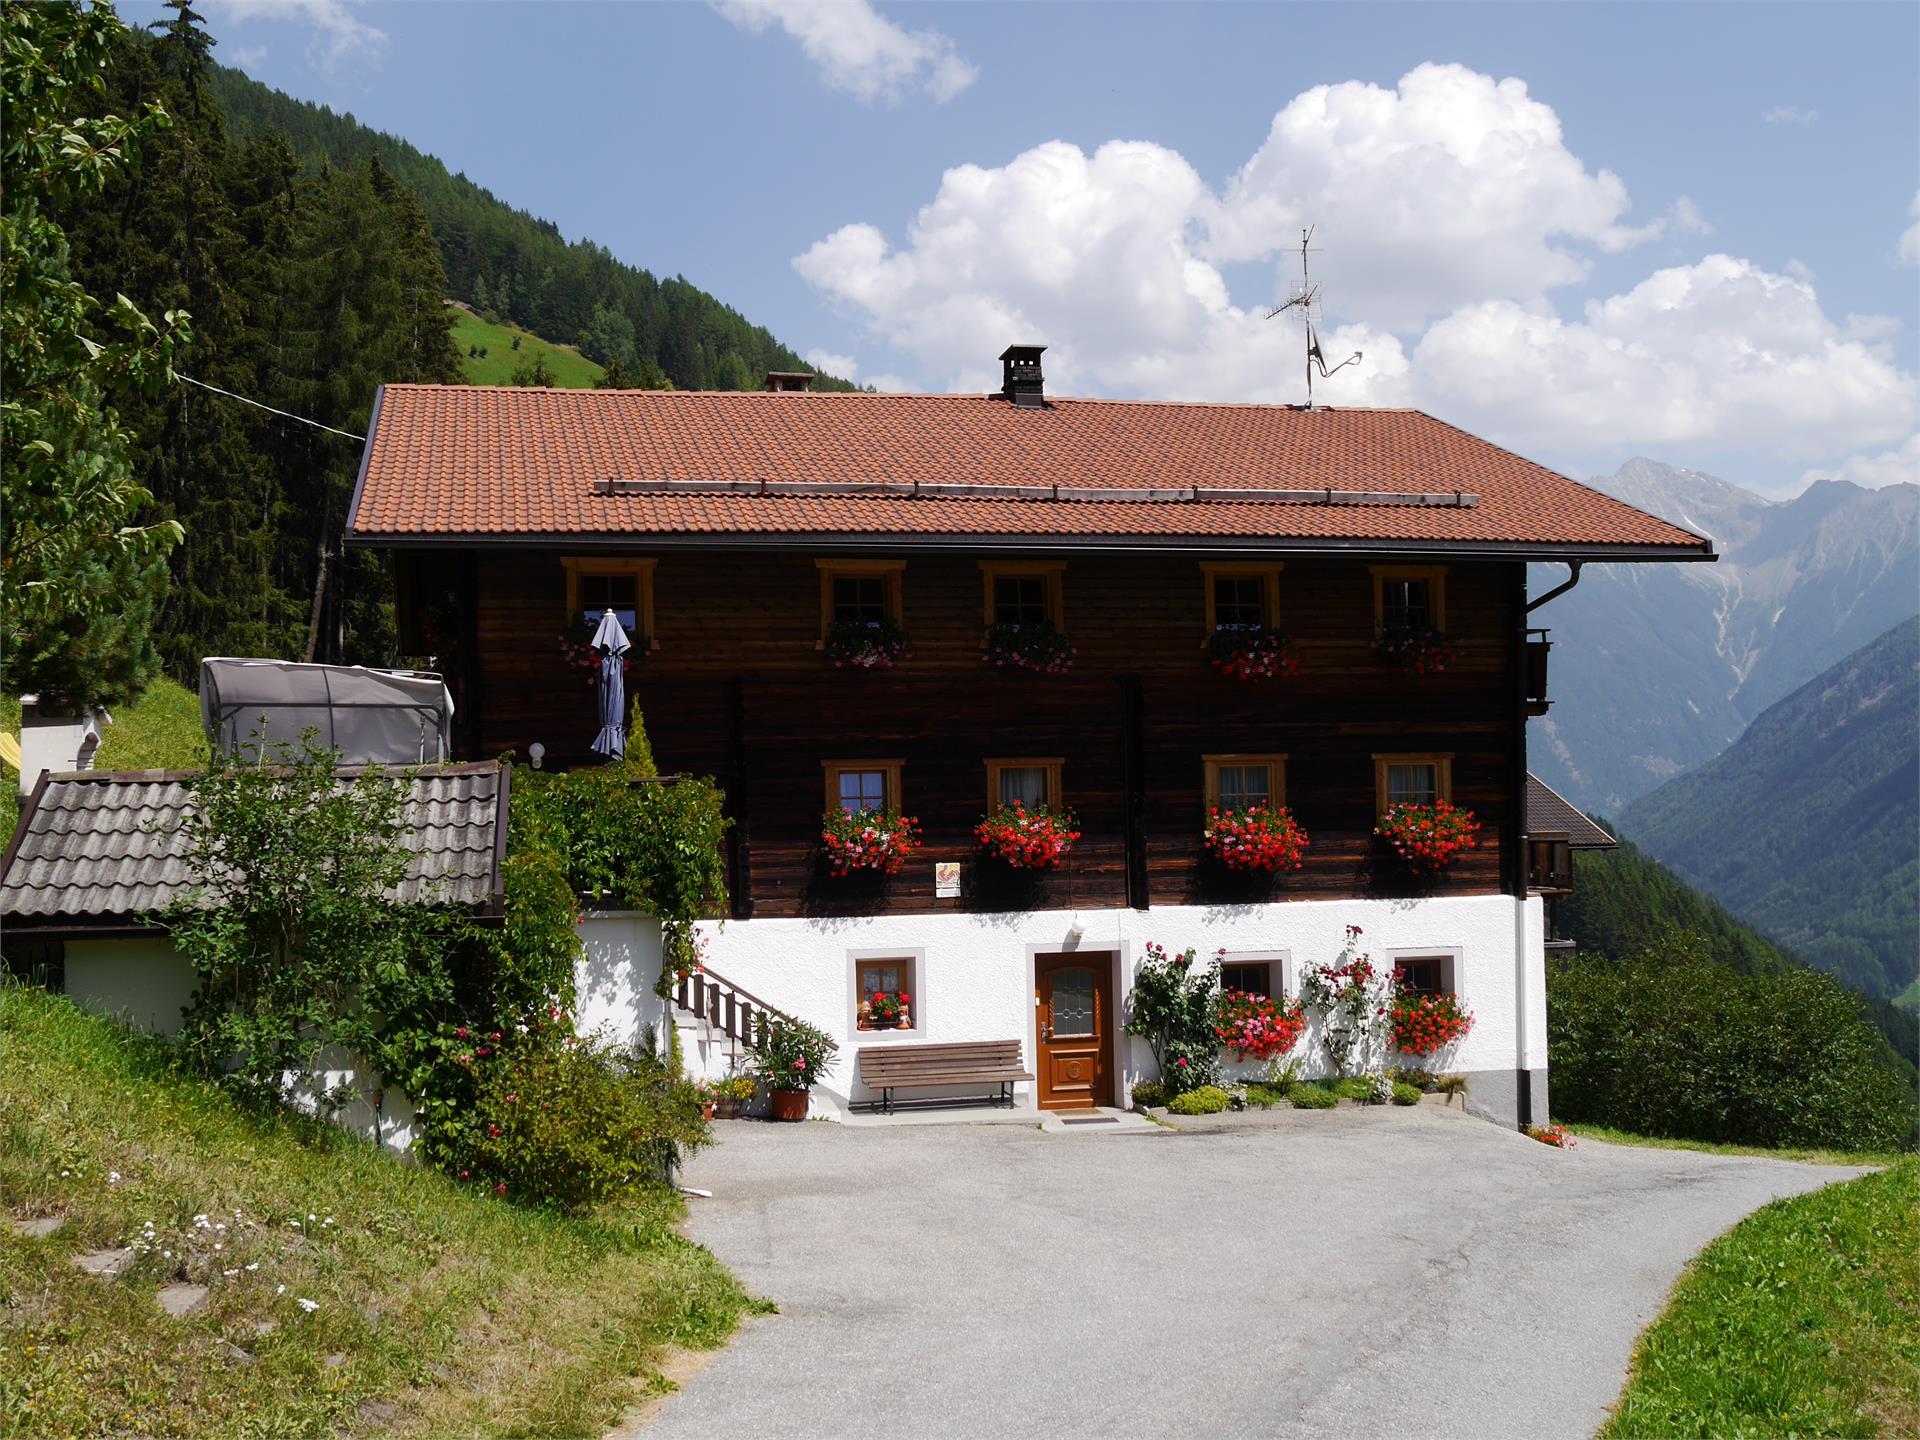 Hopfgartnerhof